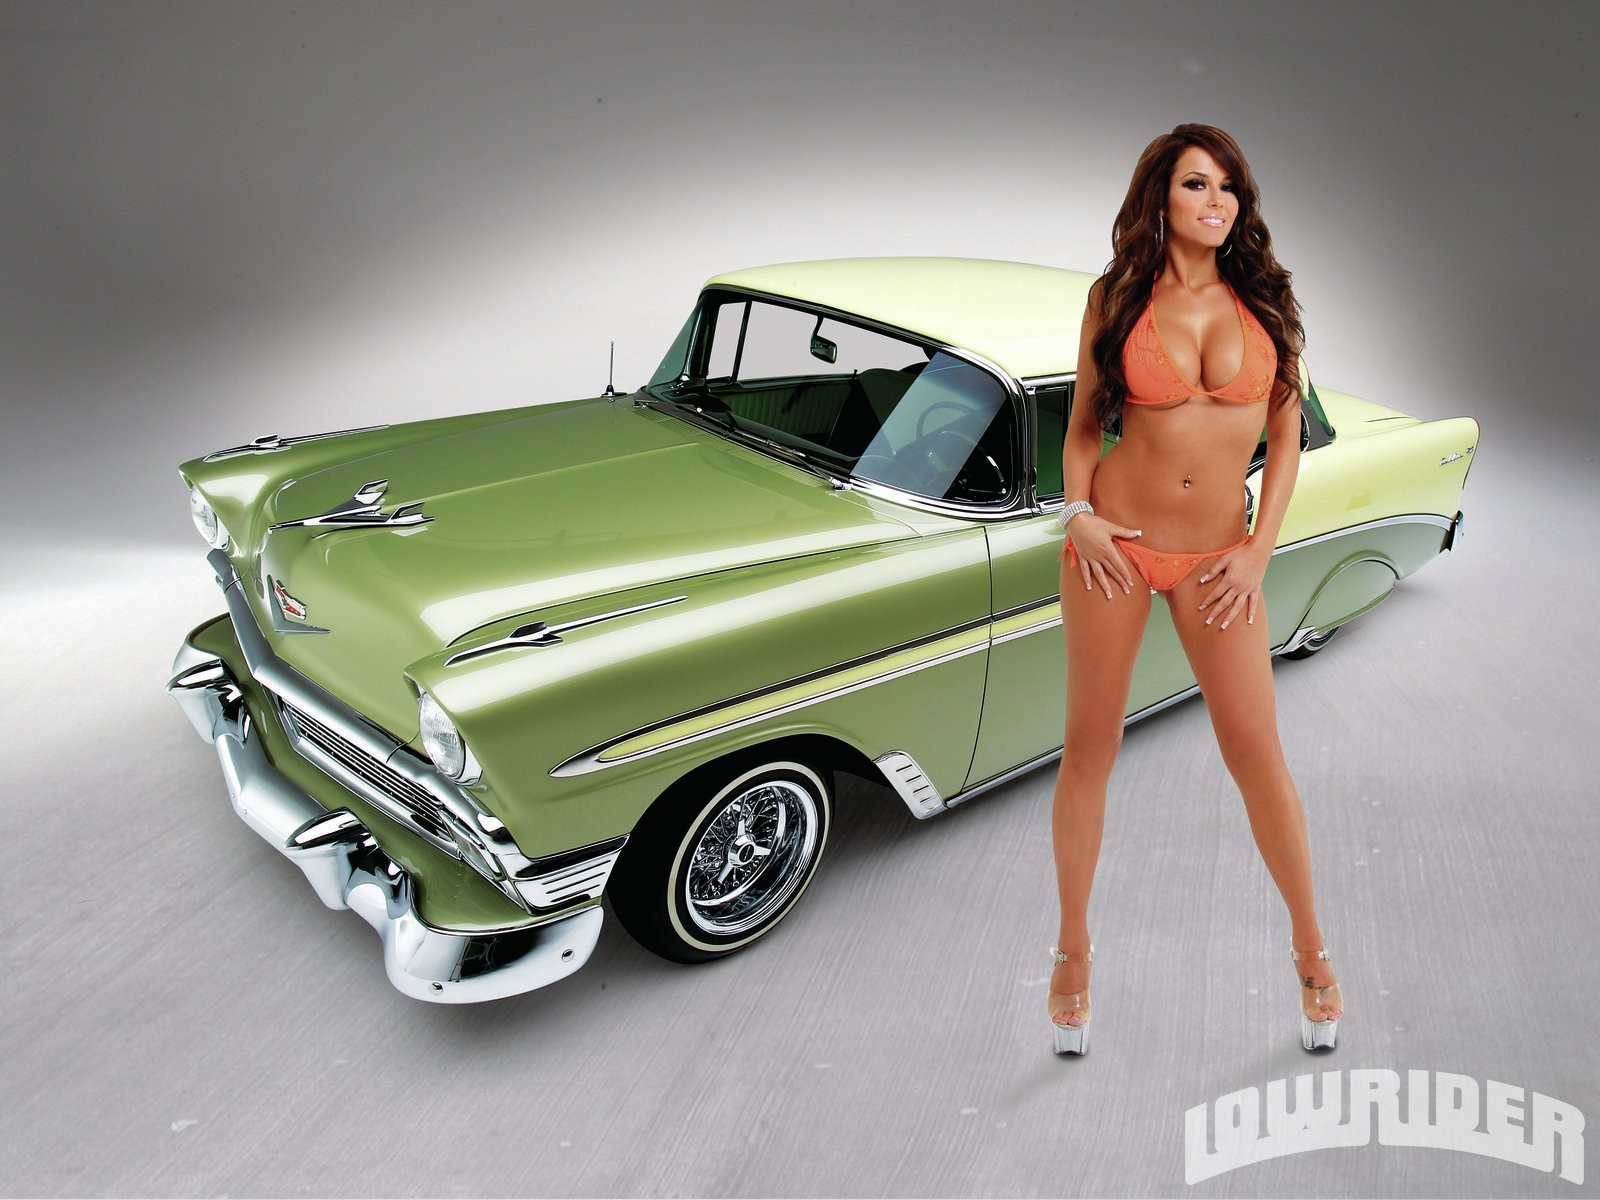 lowrider-magazine-sexy-nude-basinger-nude-playboy